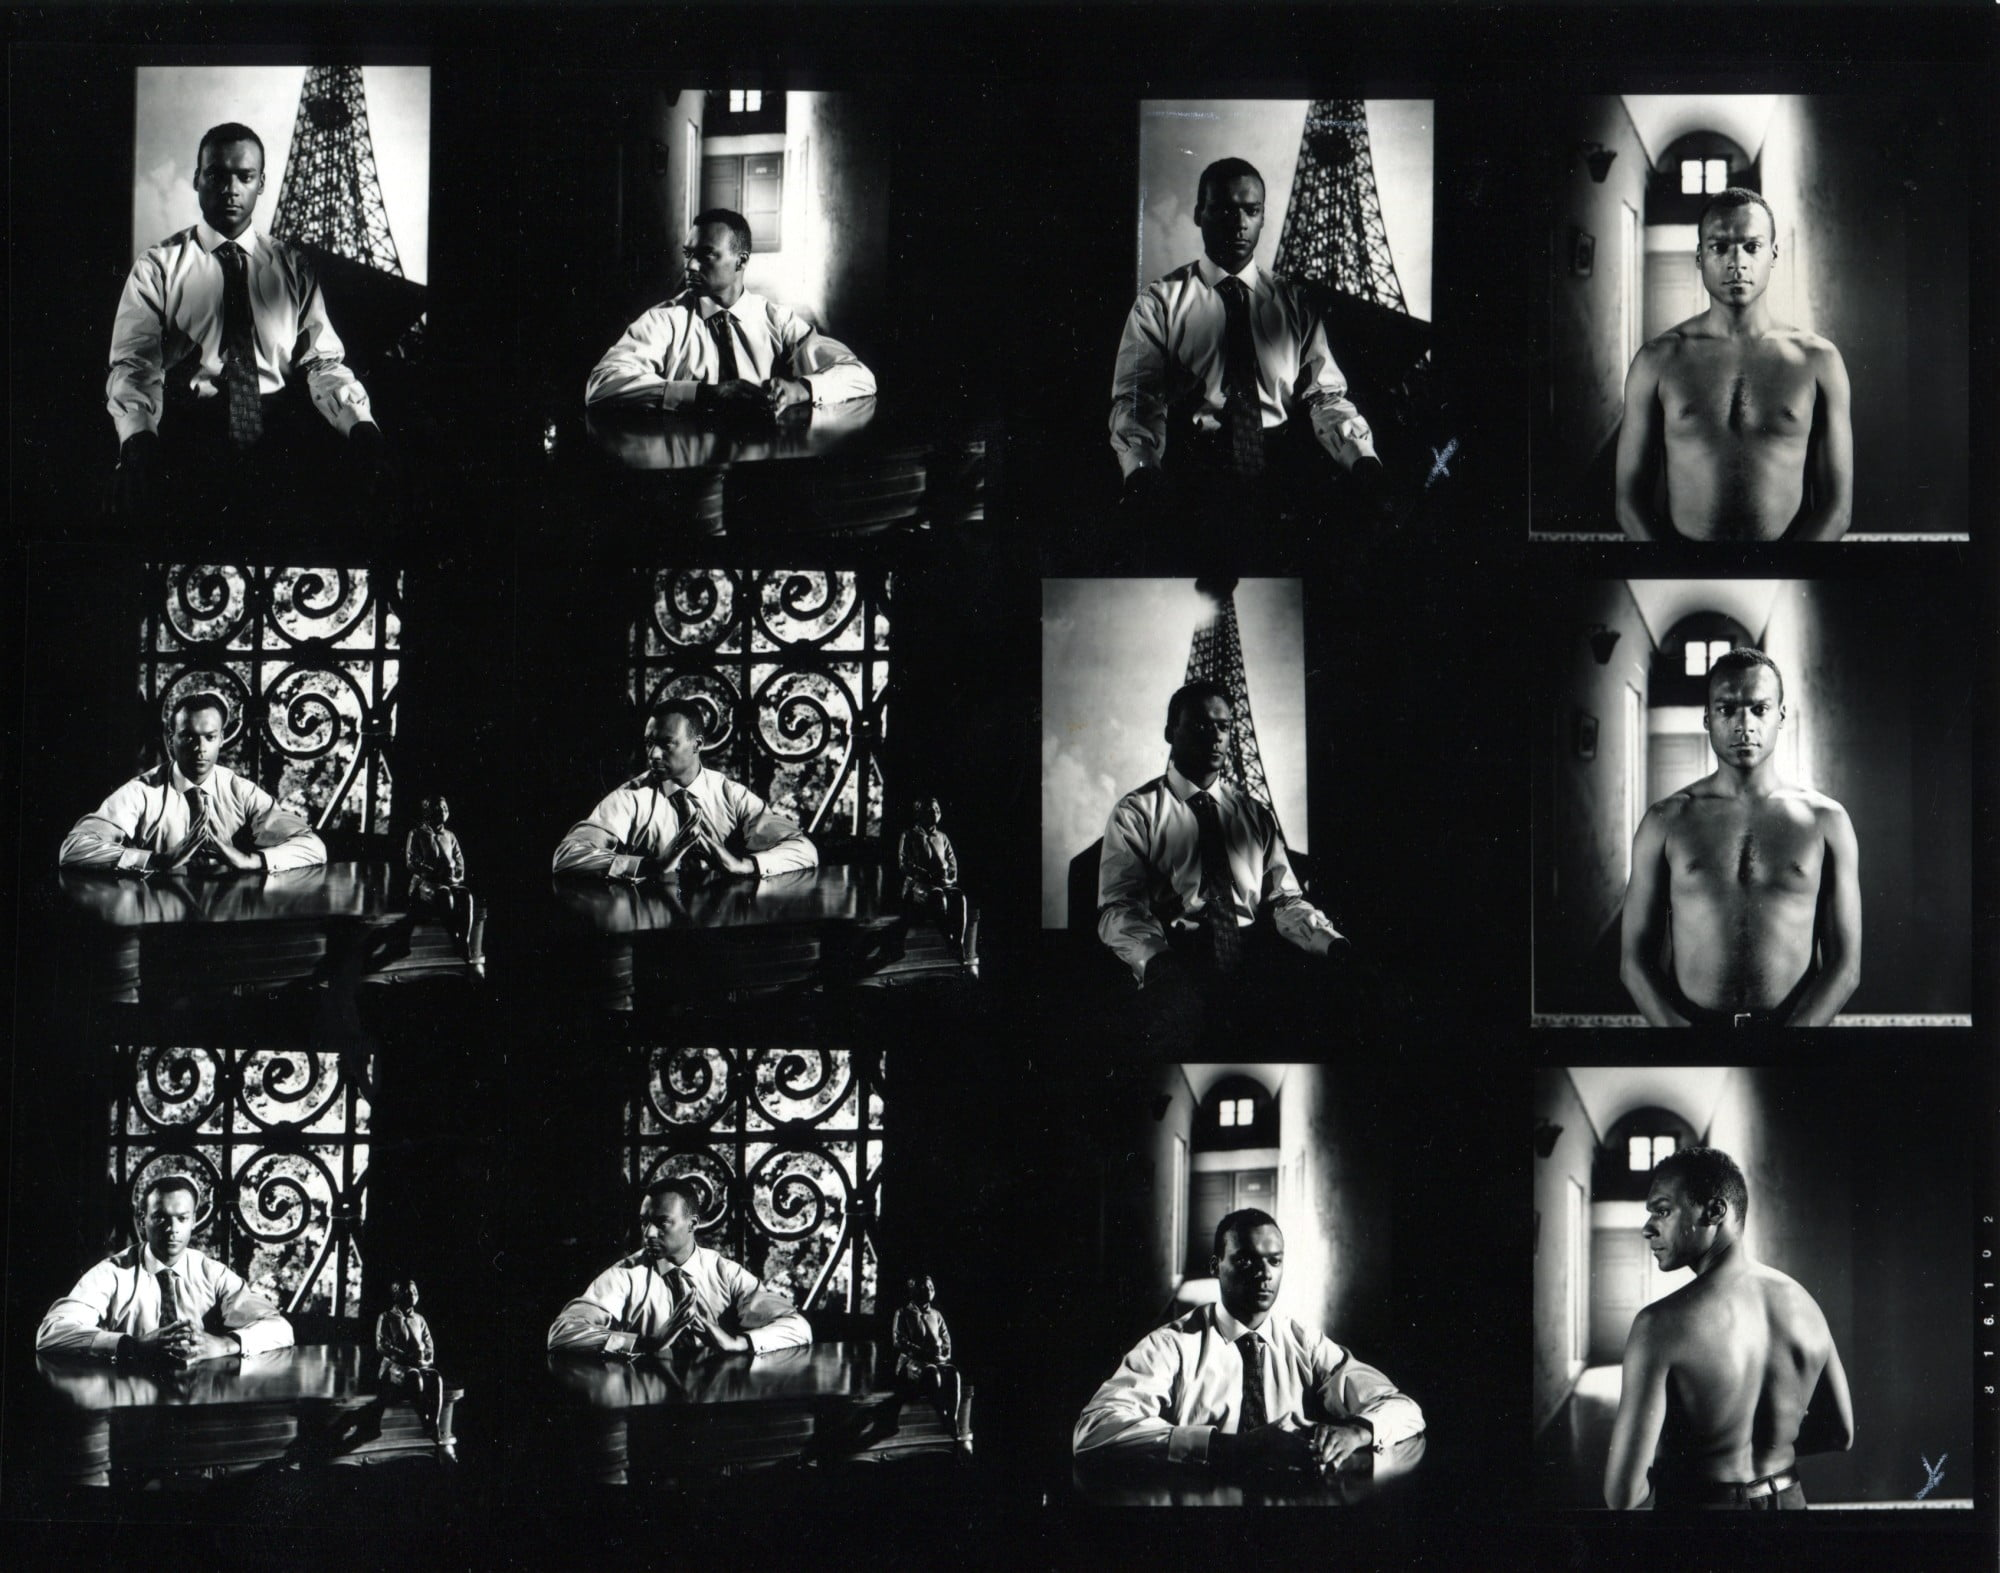 <i>Production stills «Frantz Fanon: Black Skin Whitr Mask», featuring Colin Salmon</i>